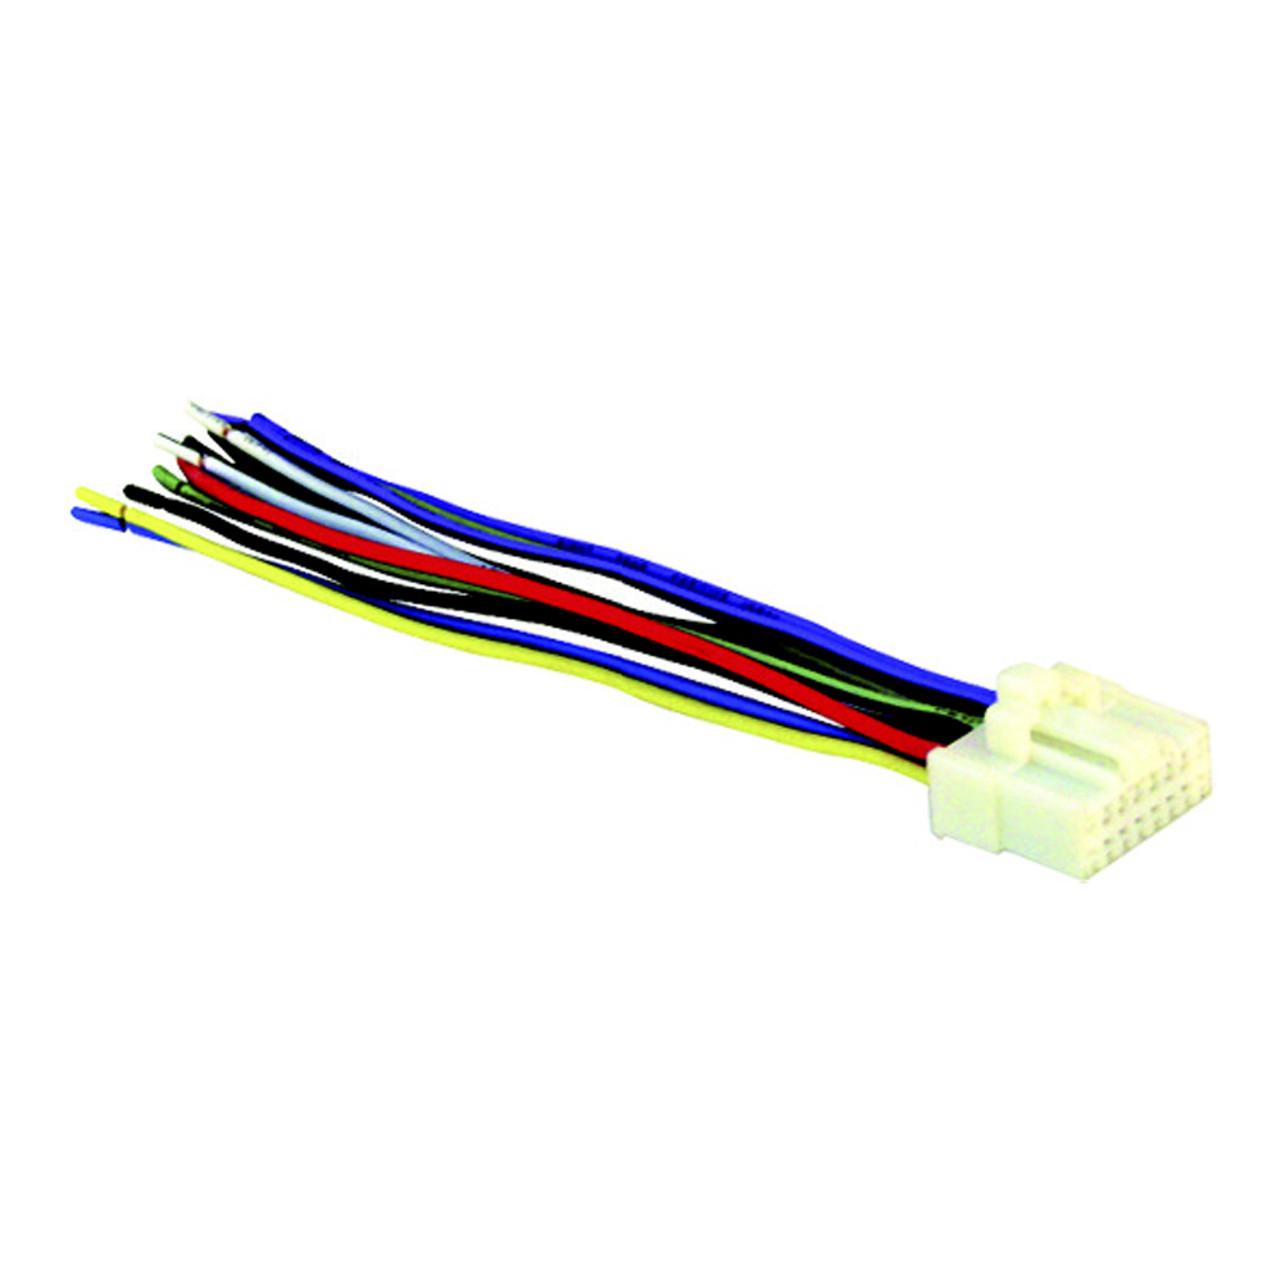 small resolution of wiring harness panasonic 2000 2005 16 pin xscorpion wiring harness panasonic 2000 2005 16 pin